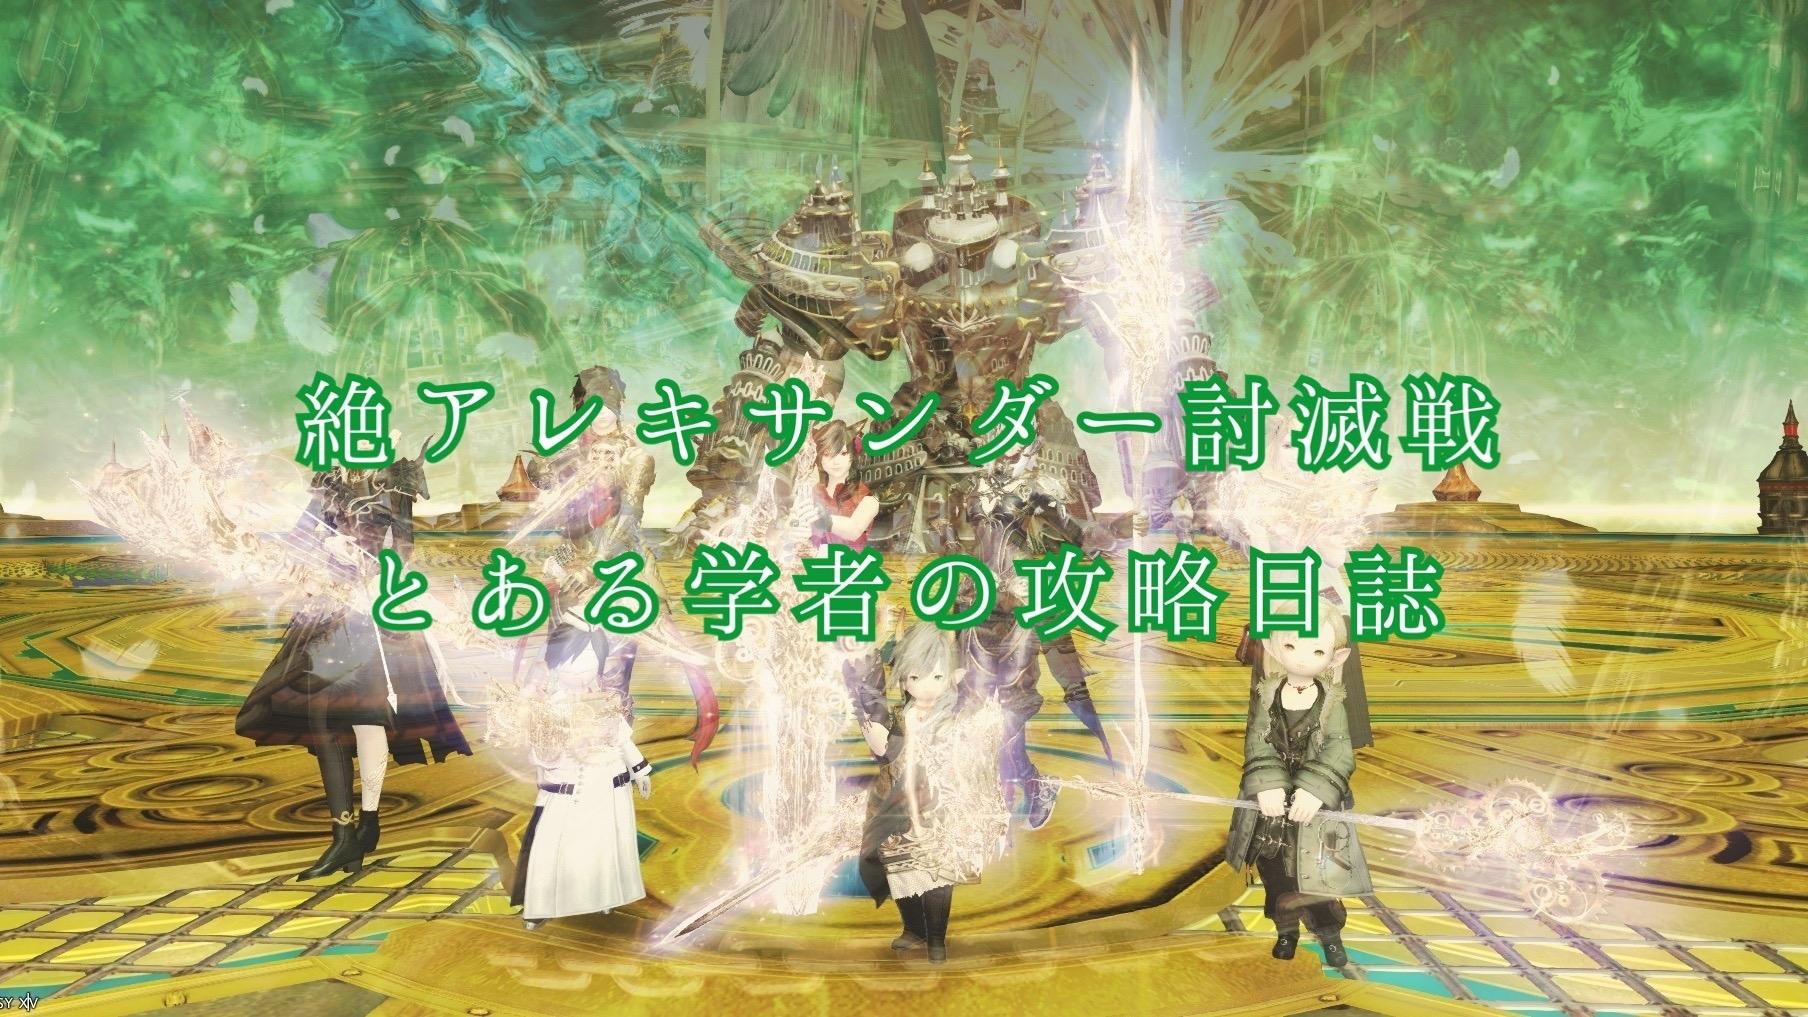 【FF14】絶アレキサンダー討滅戦~とある学者の攻略日誌~